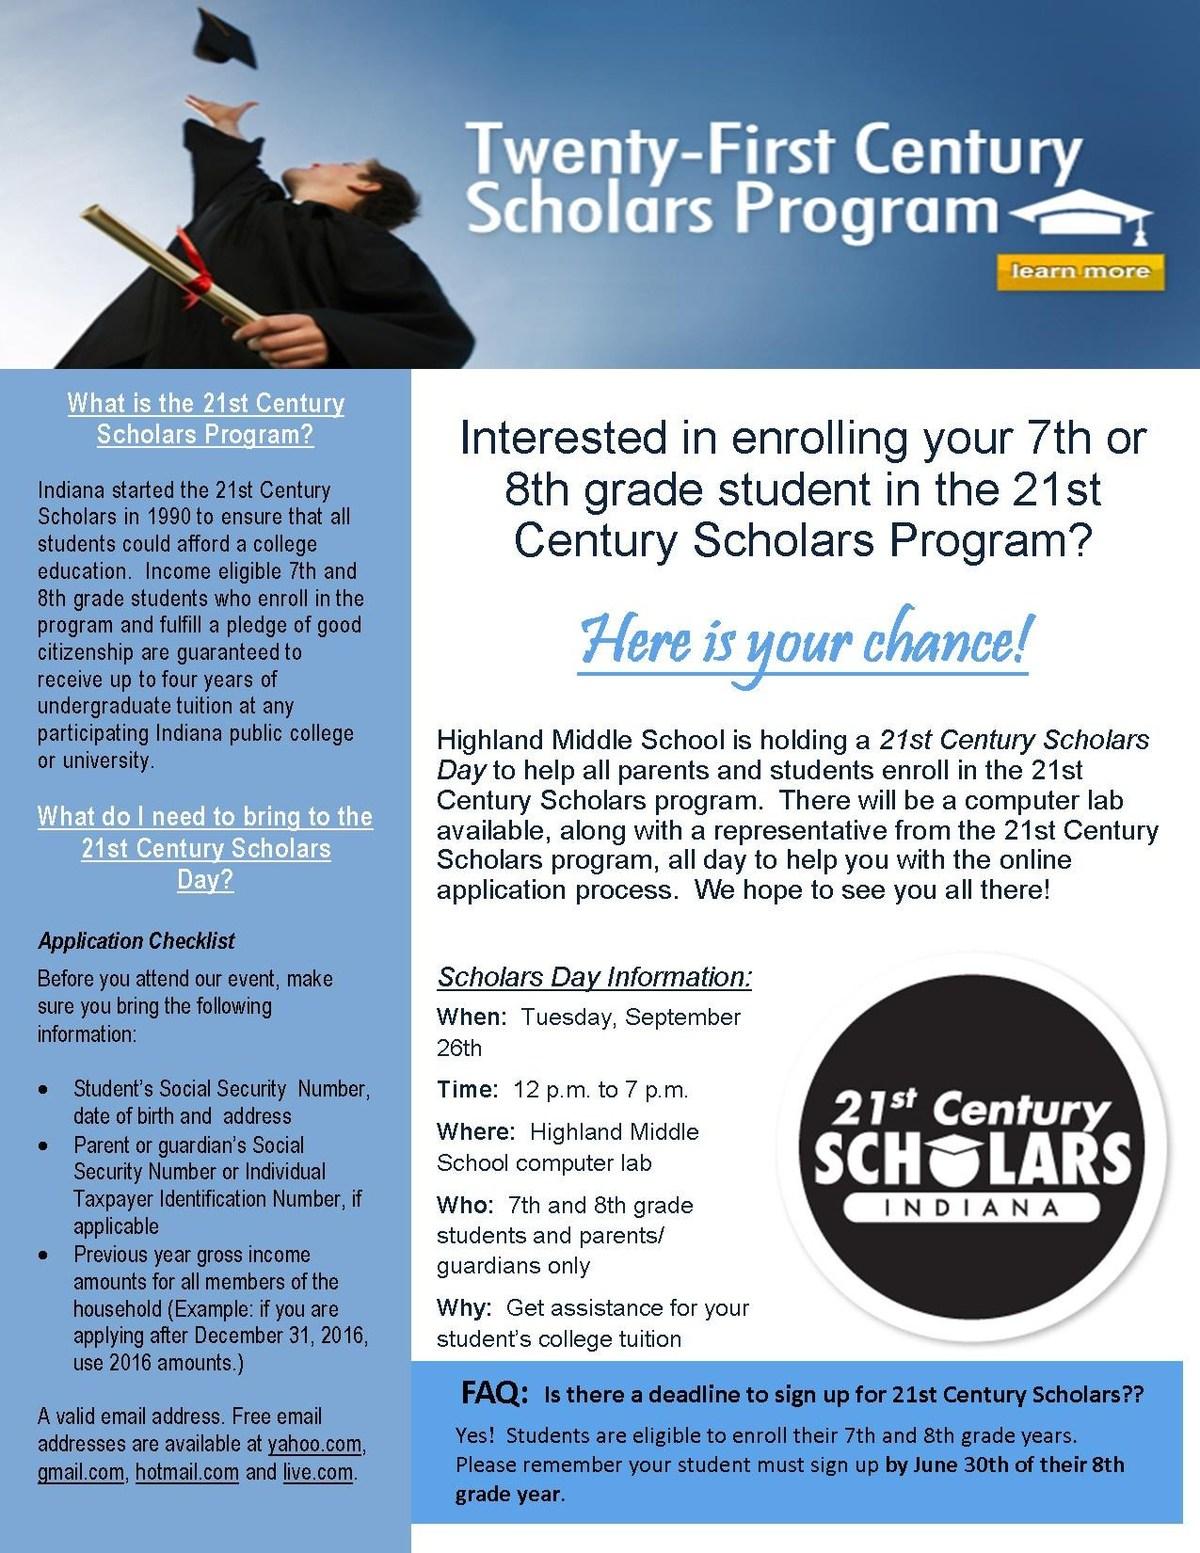 21st Century Scholars Program